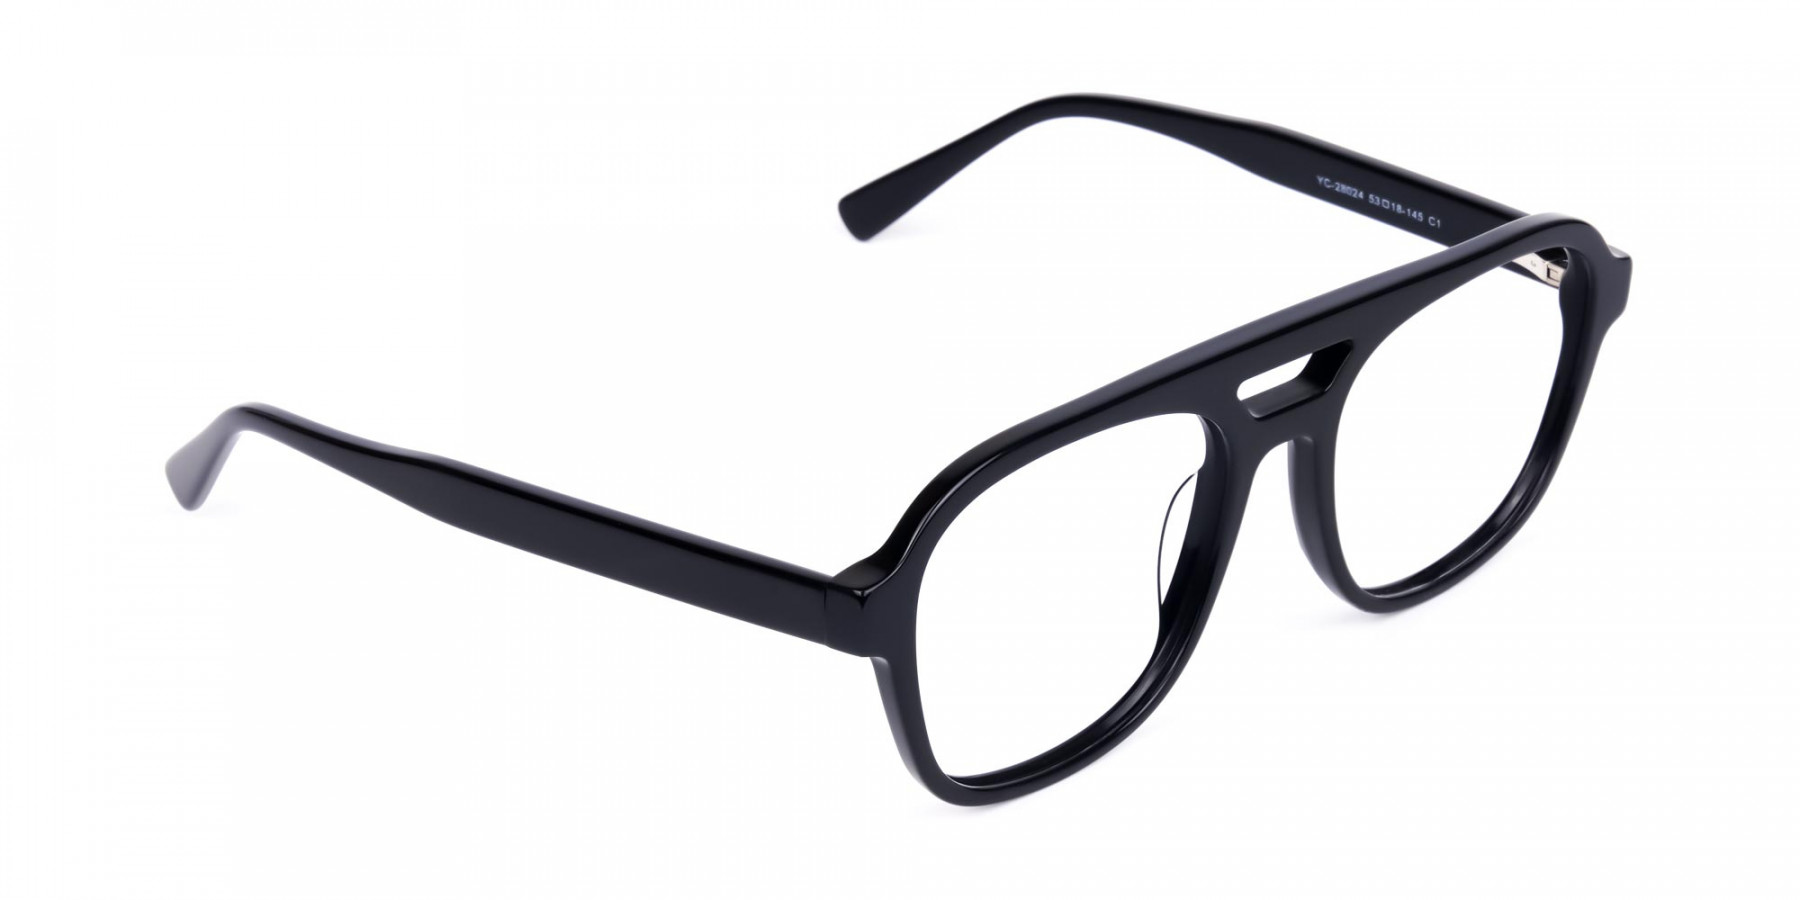 Simple-Black-Aviator-Glasses-1